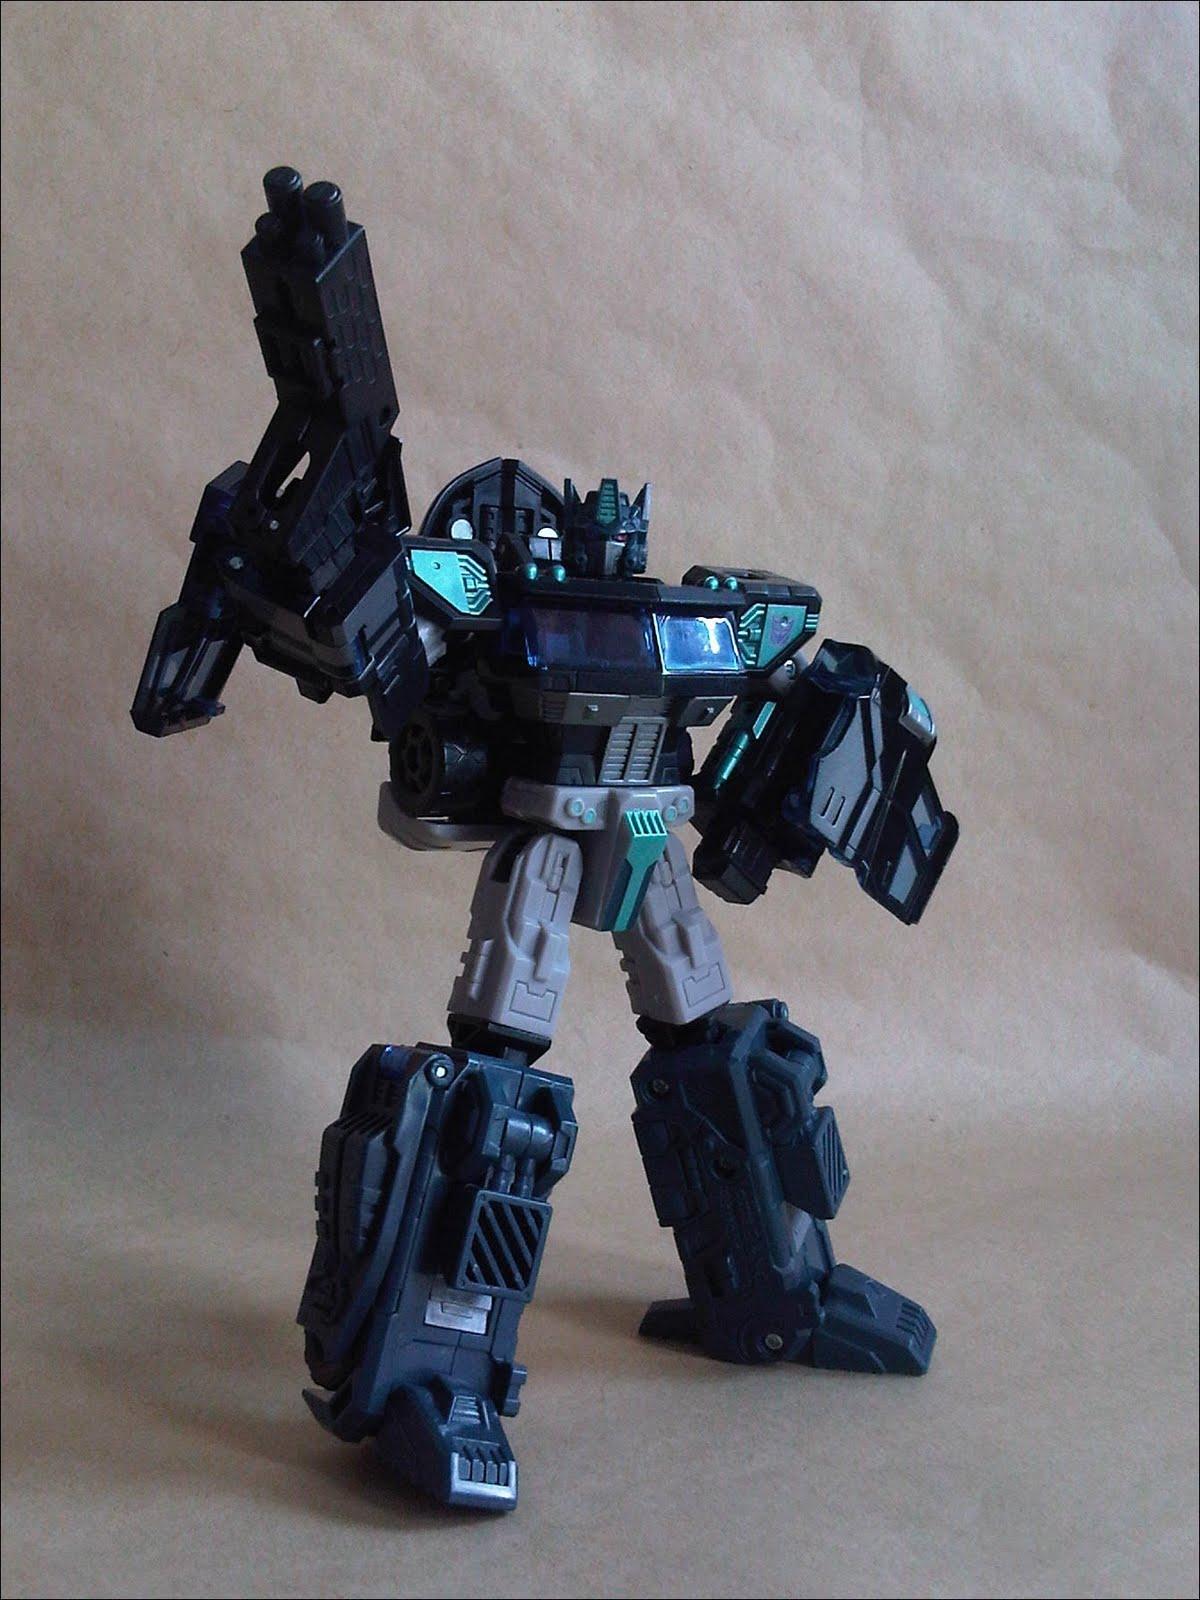 Antrex Collection Transformers Nemesis Prime 2008 Sdcc